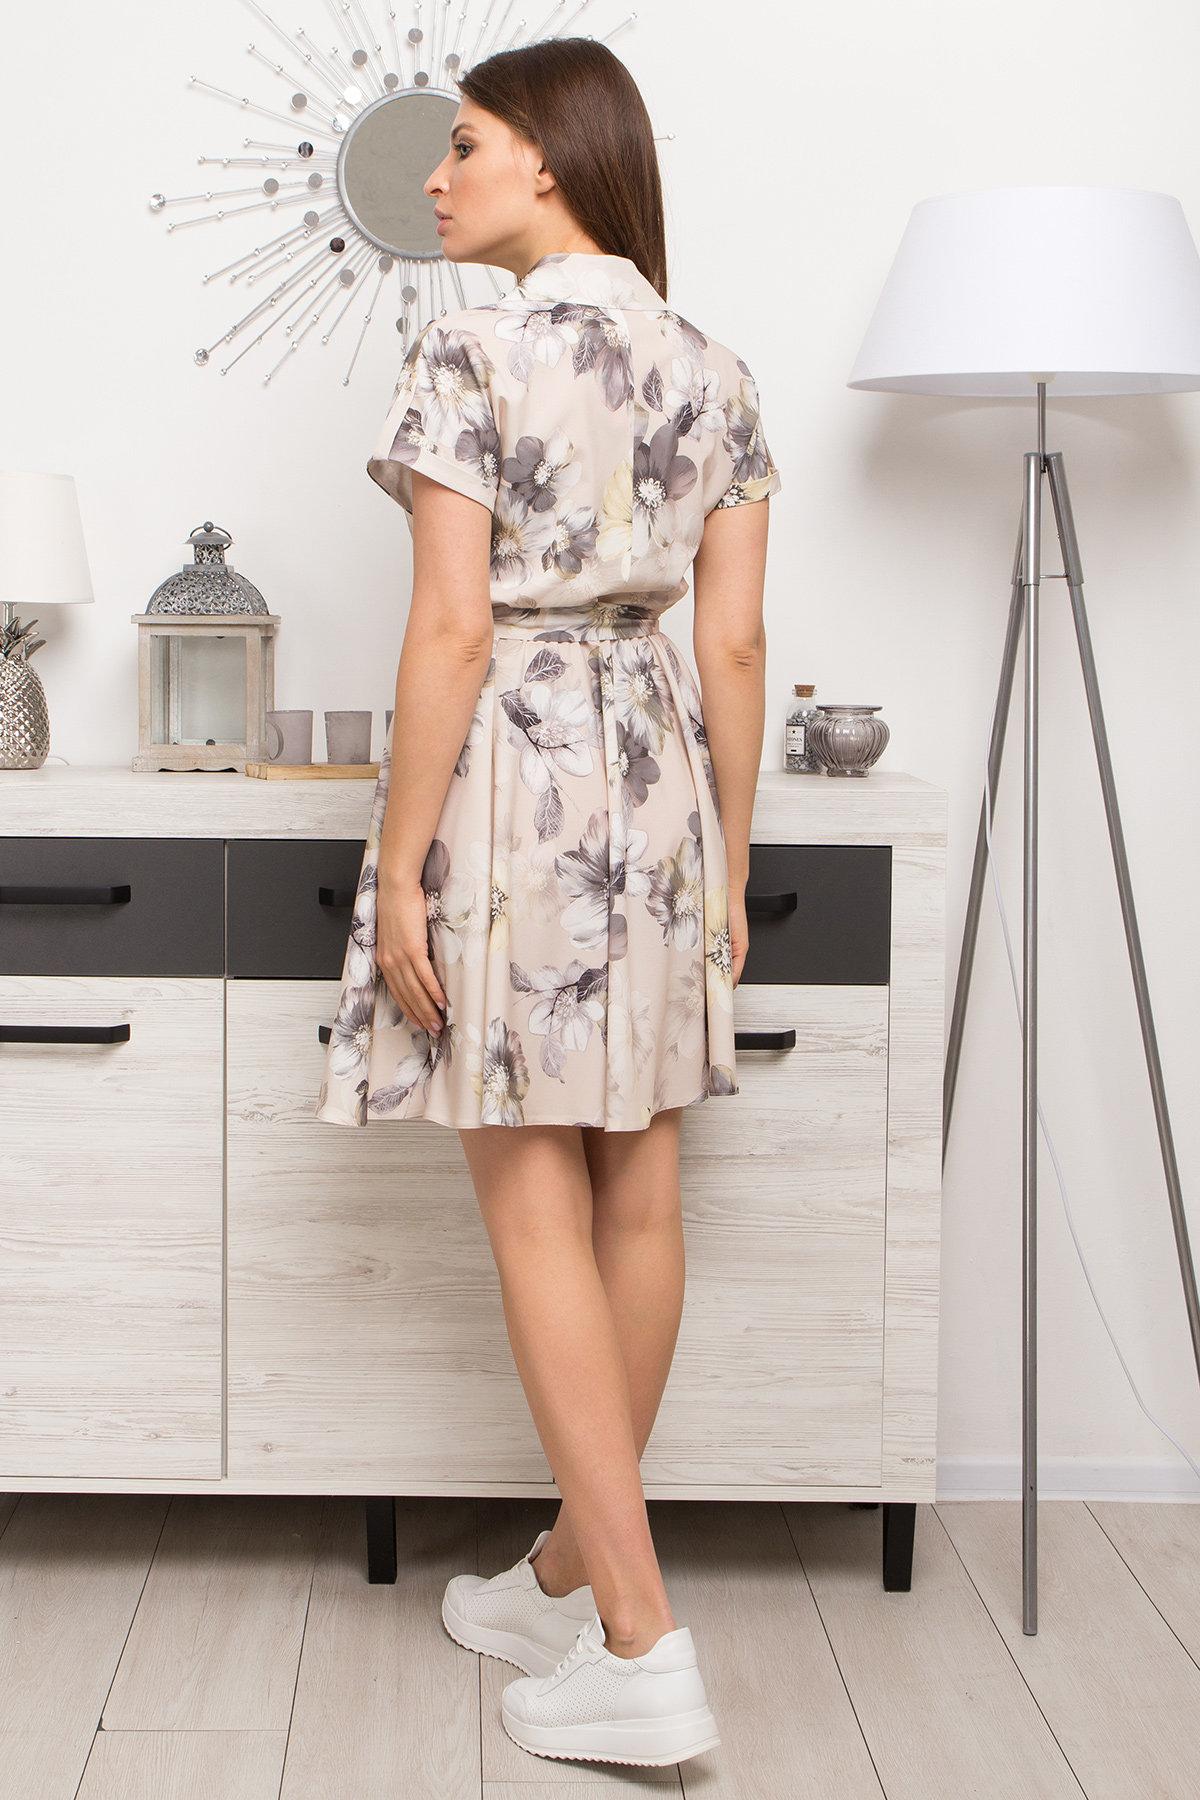 Платье Санжар 9095 АРТ. 45416 Цвет: Цветы кр беж/мол/охра - фото 5, интернет магазин tm-modus.ru